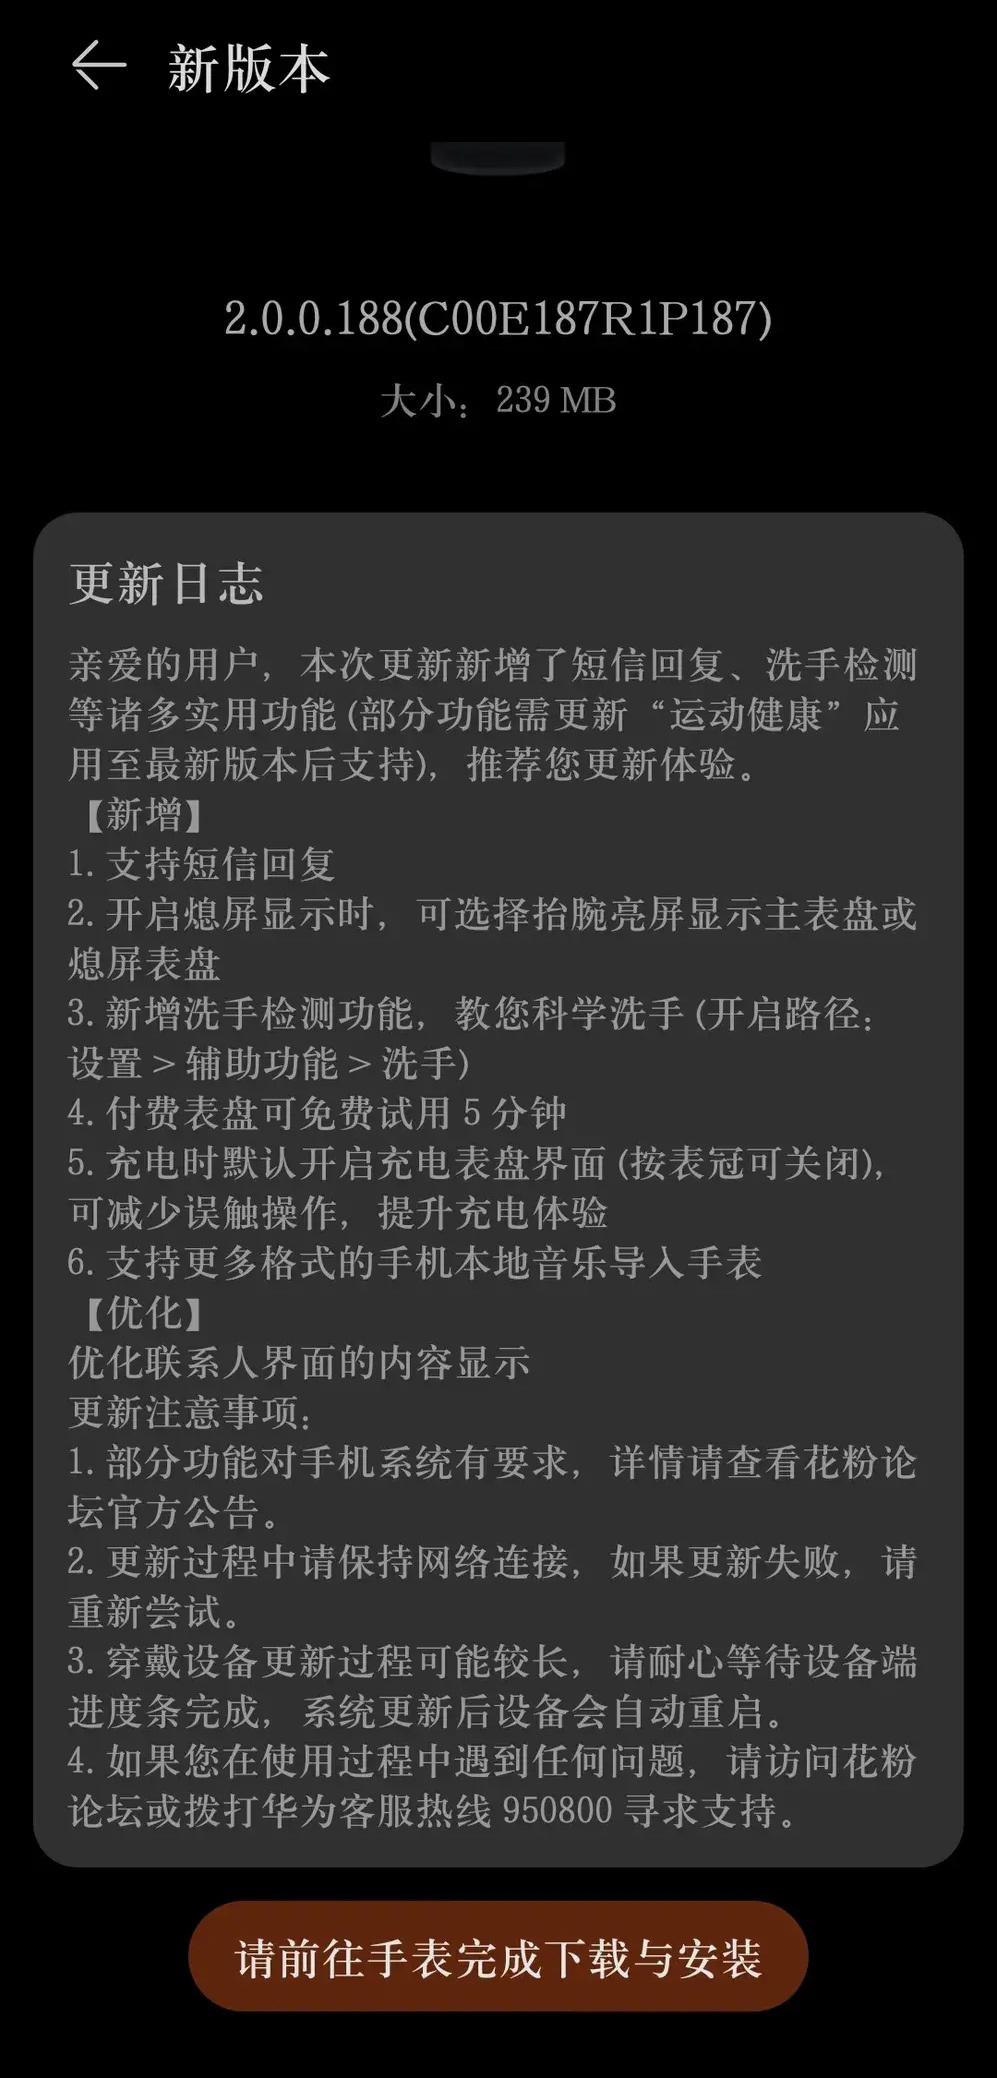 Huawei Watch 3 Series HarmonyOS 2.0.0.188